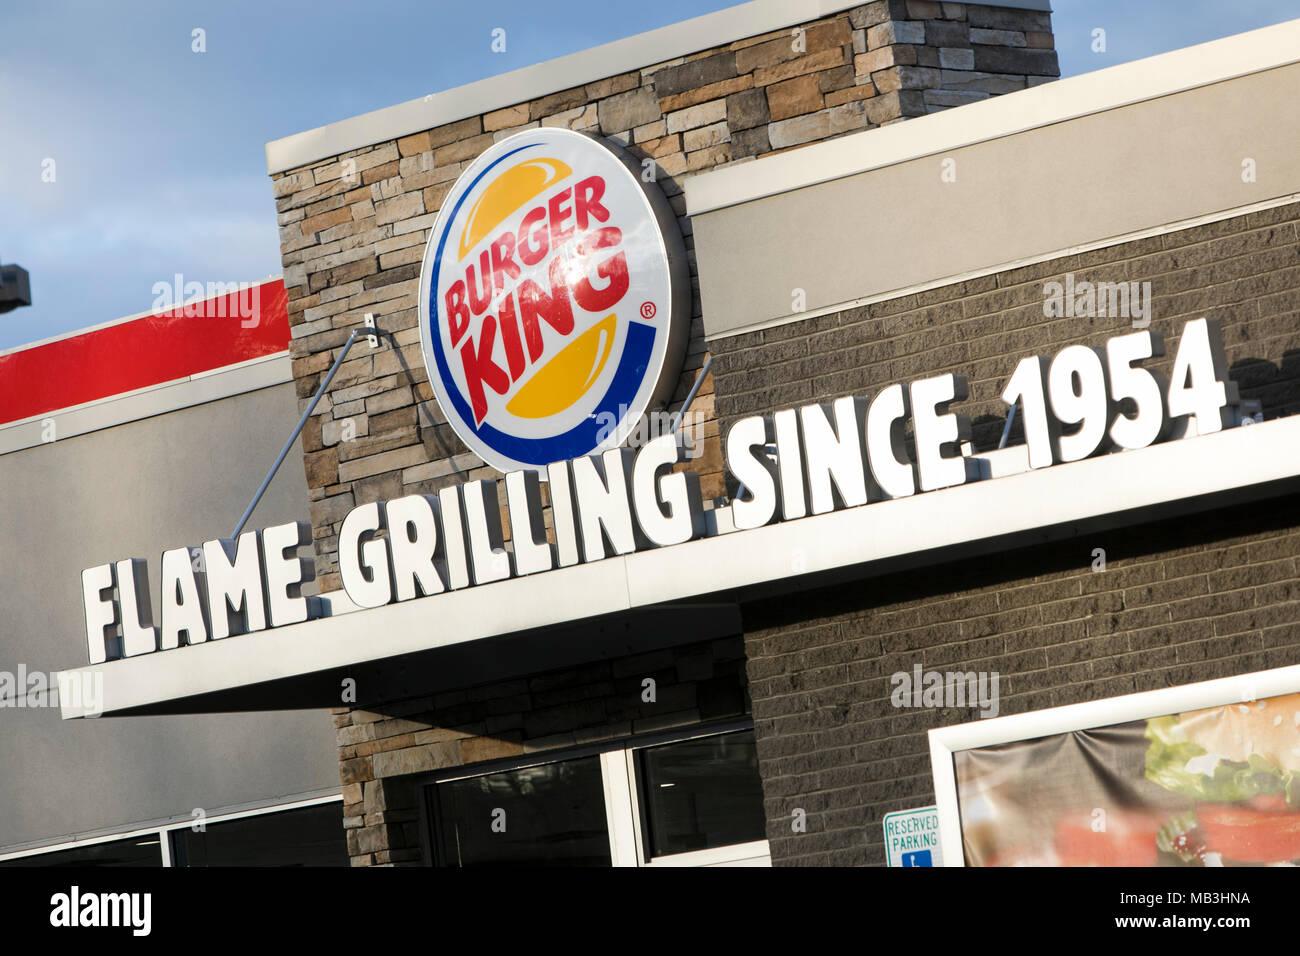 Ein Burger King fast food Restaurant Lage in Hagerstown, Maryland am 5. April 2018. Stockfoto